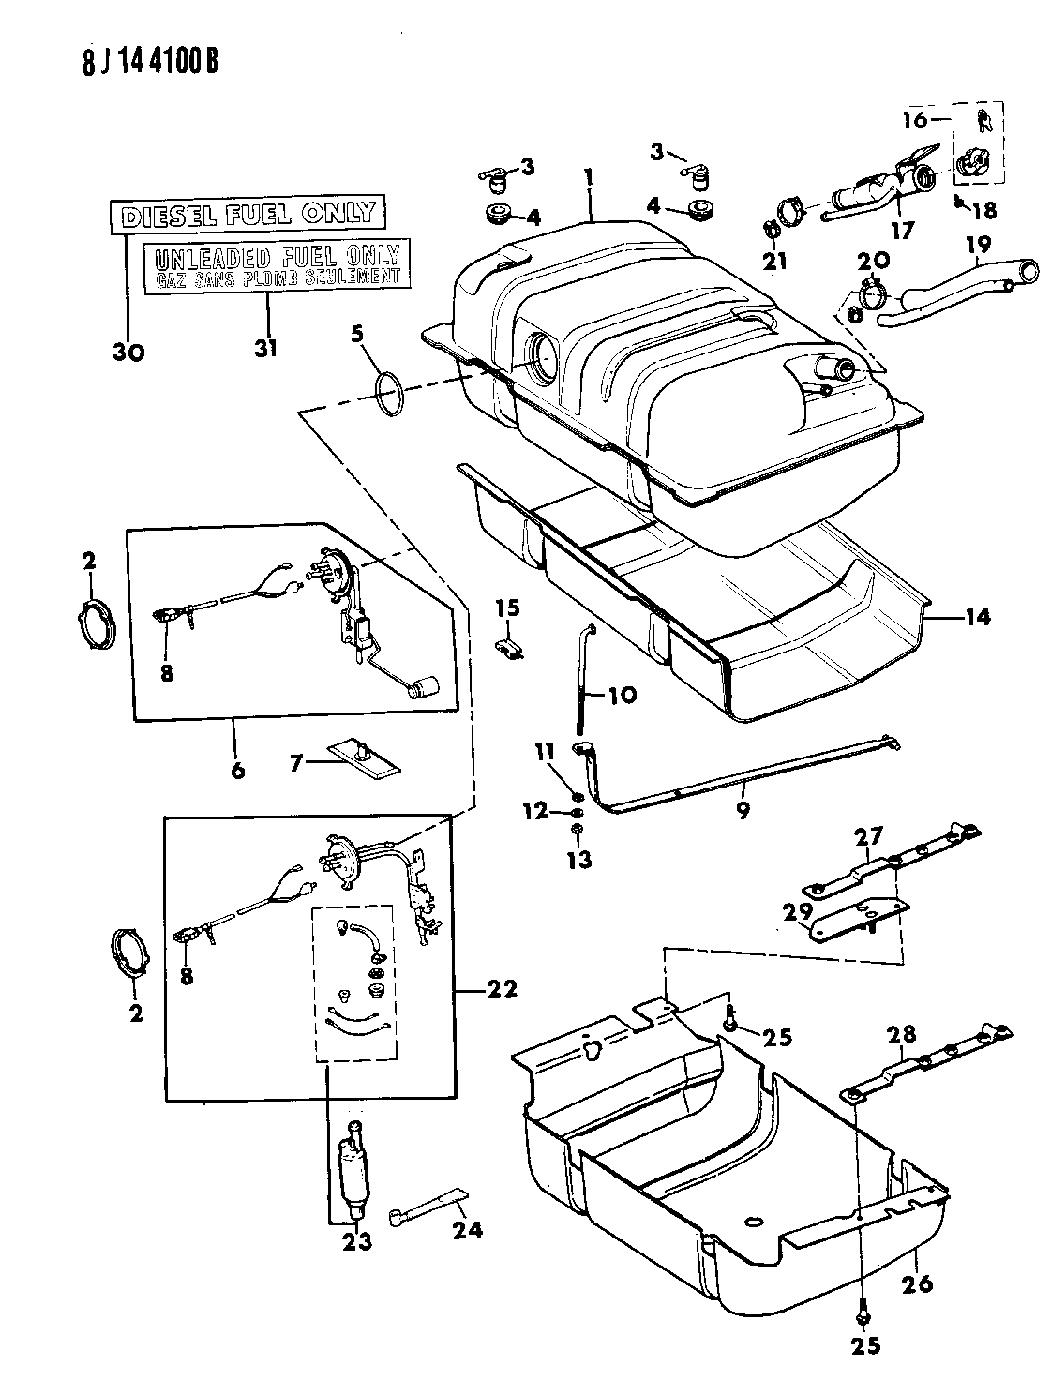 53000575 - Genuine Jeep O RING-SENDING UNIT